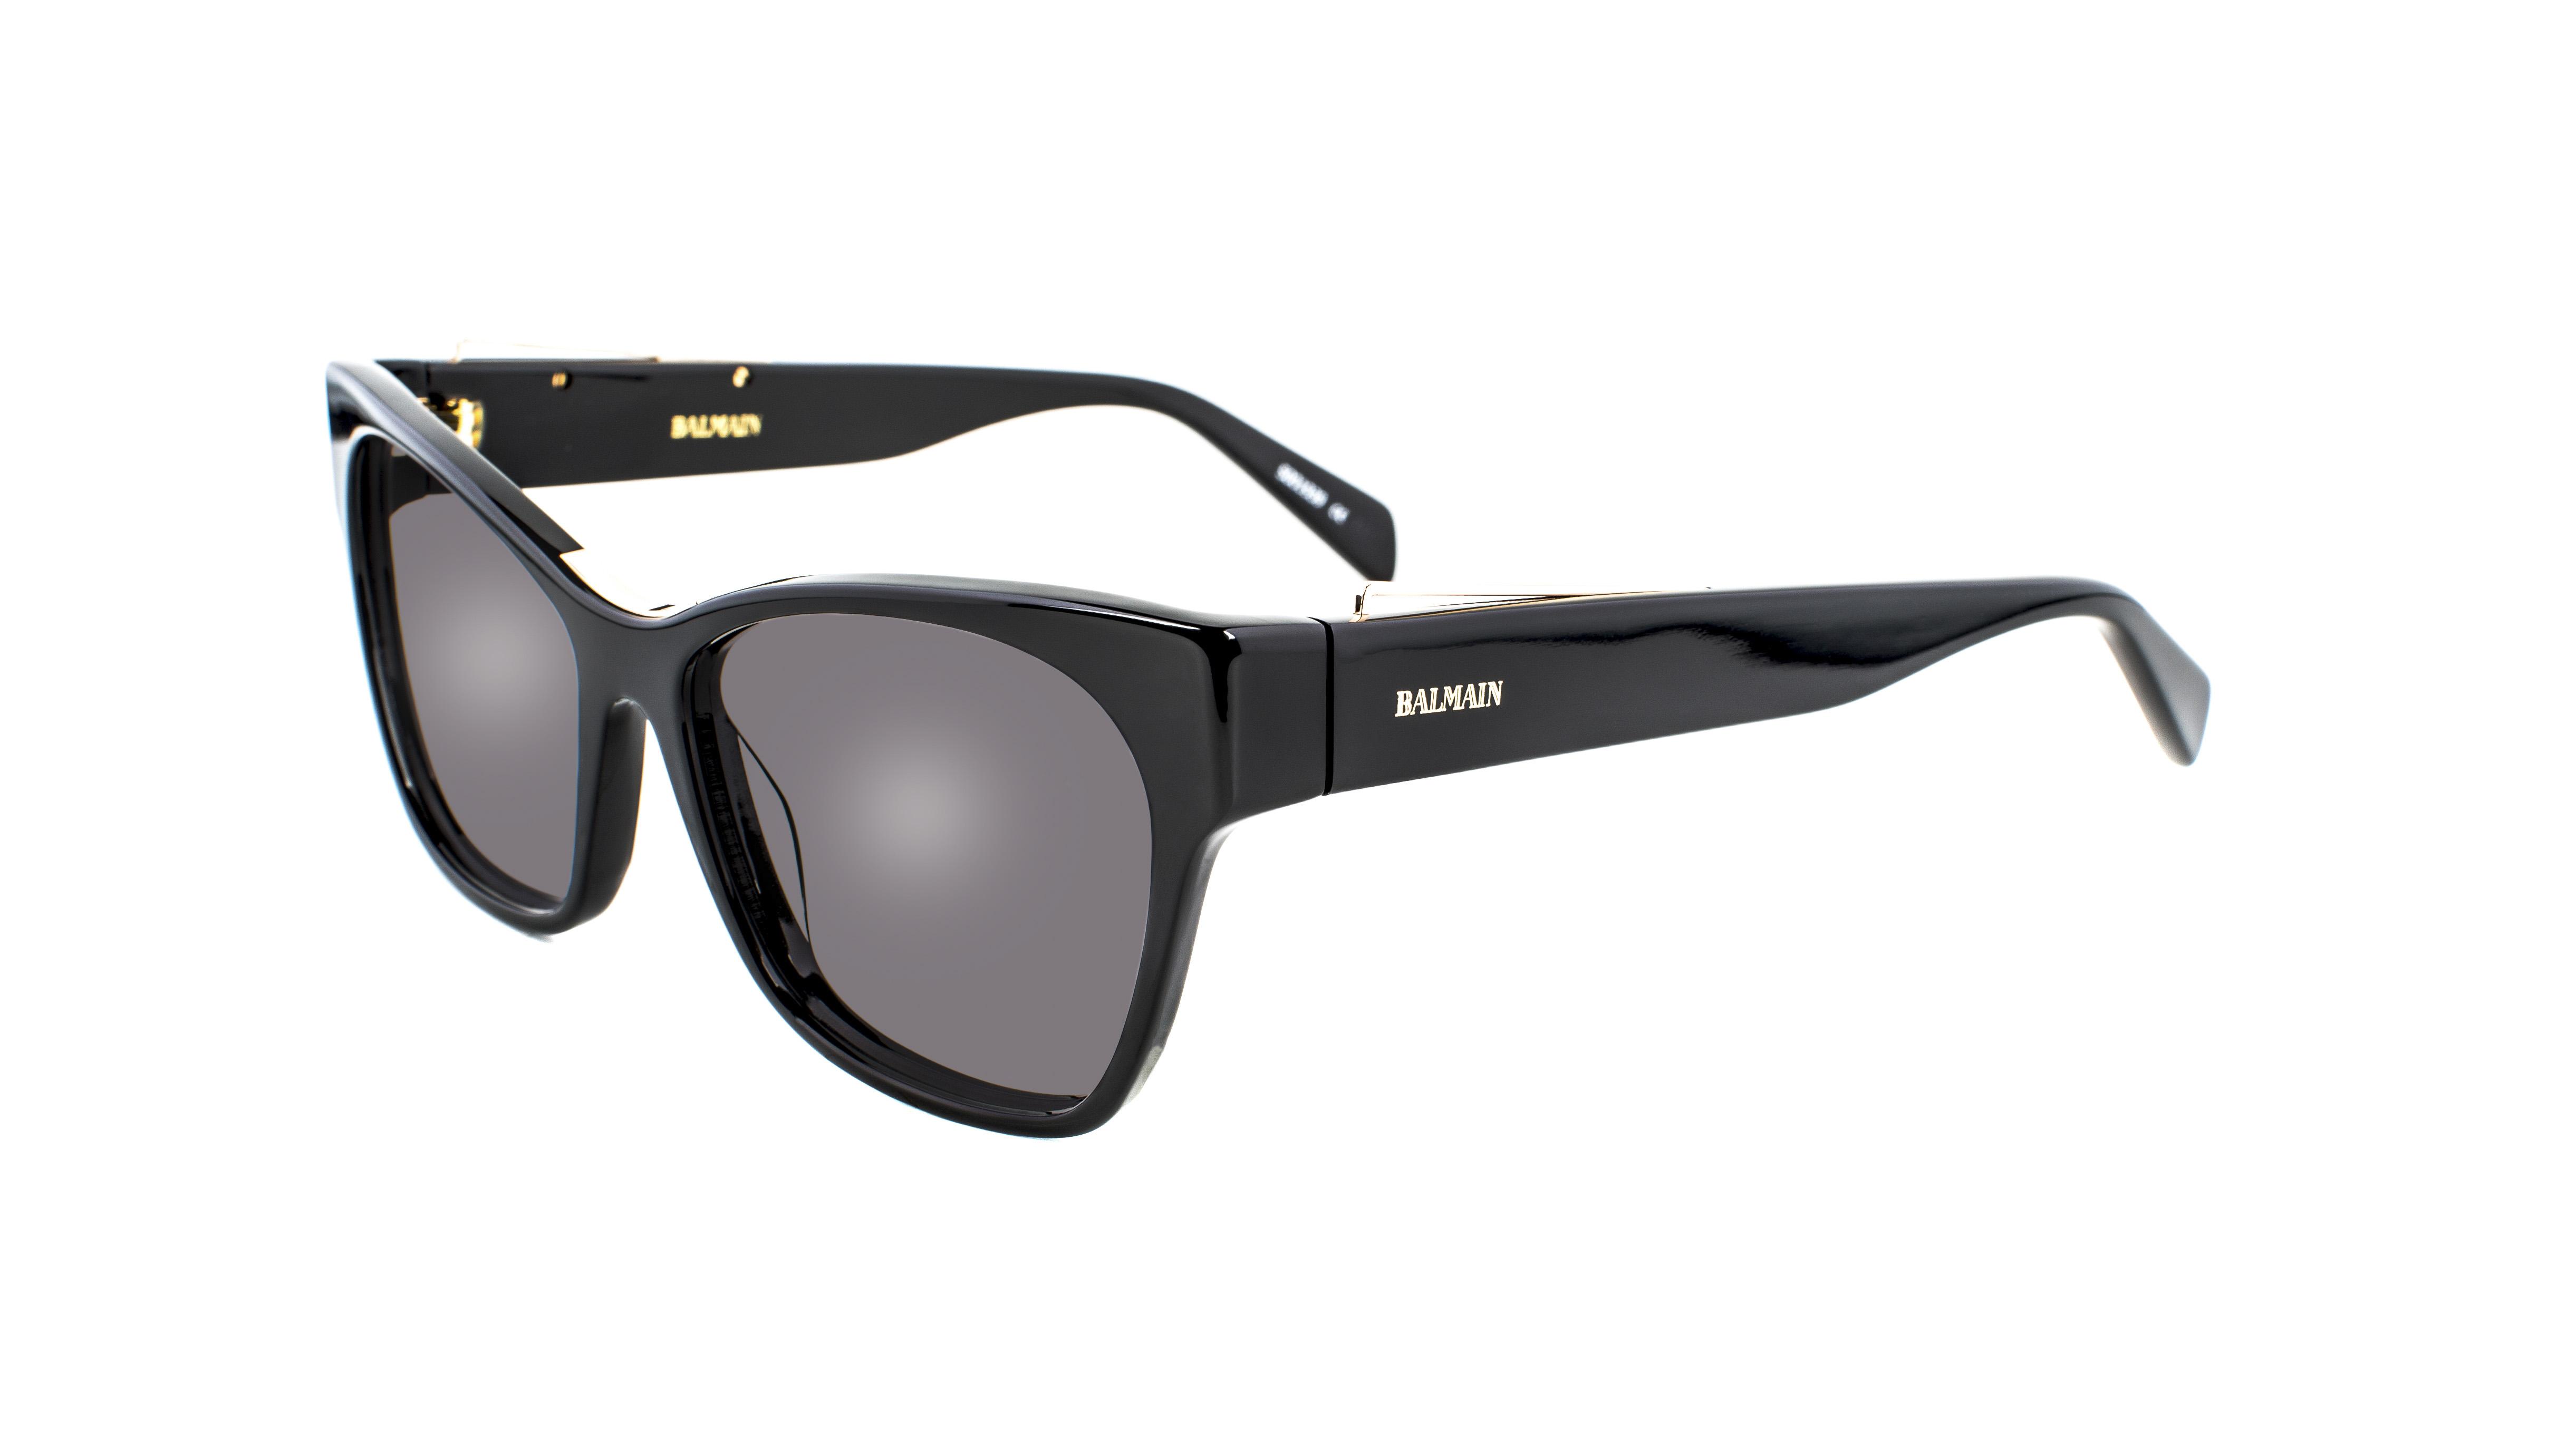 Balmain x Specsavers BL1528S SUN RX 30570634 - RRP 2 pairs single vision $459 (2)